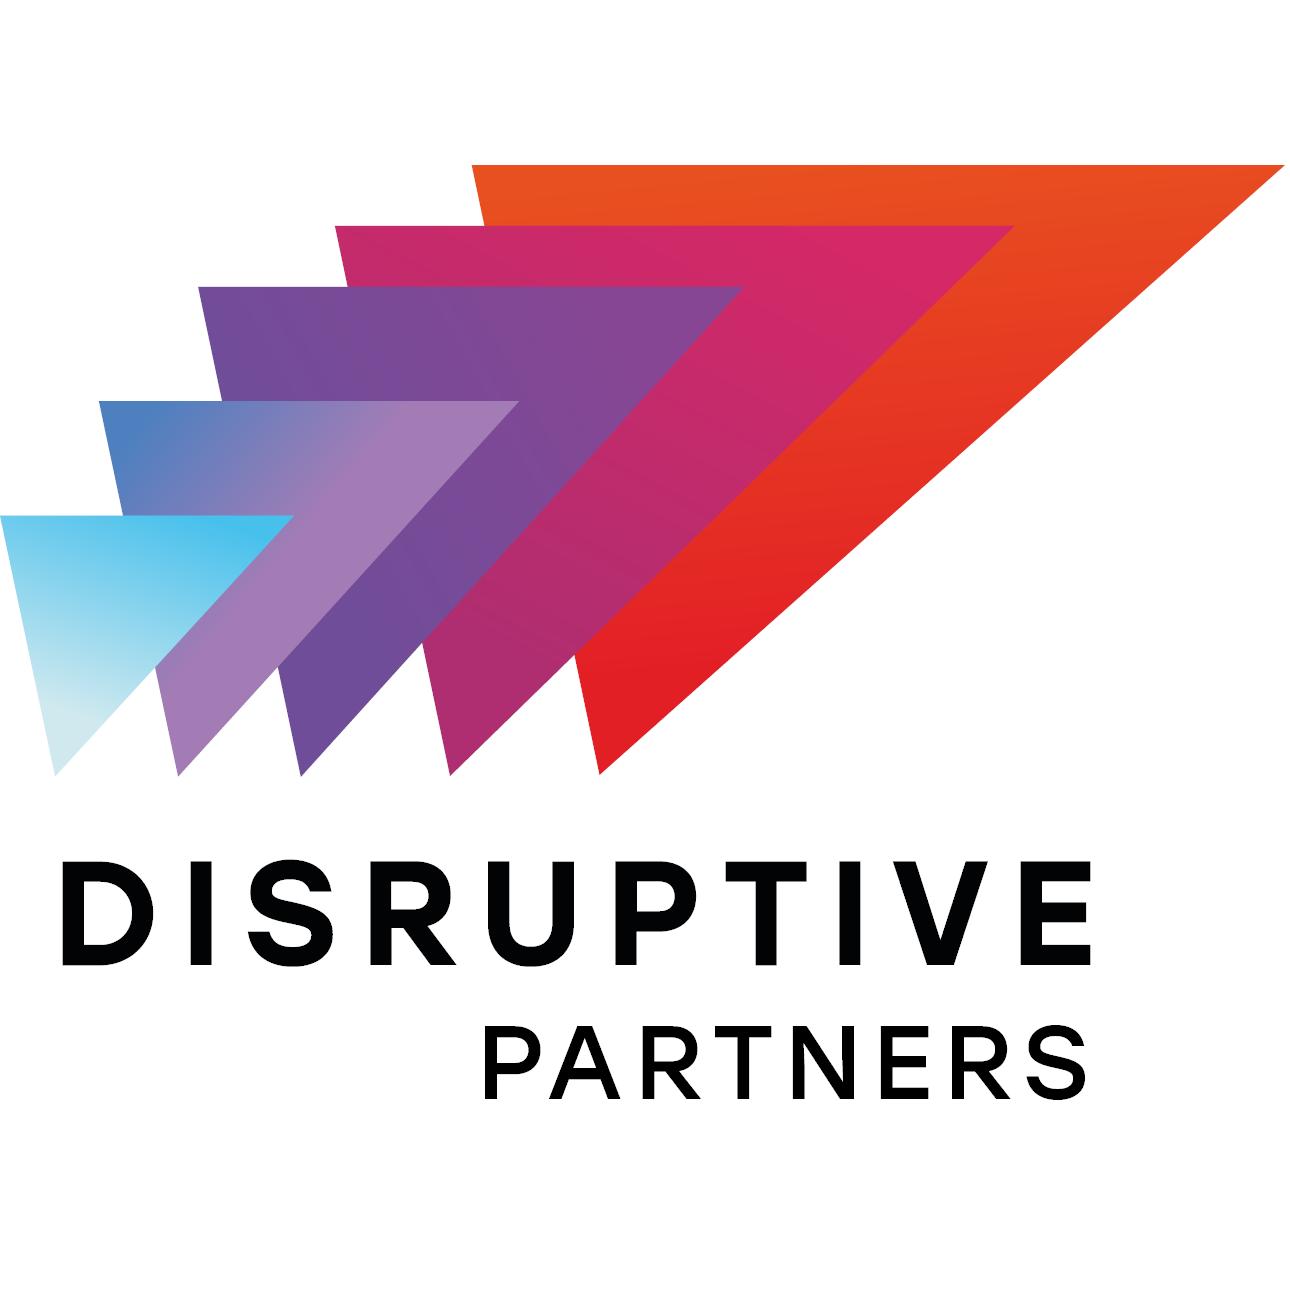 Disruptive Partners logo